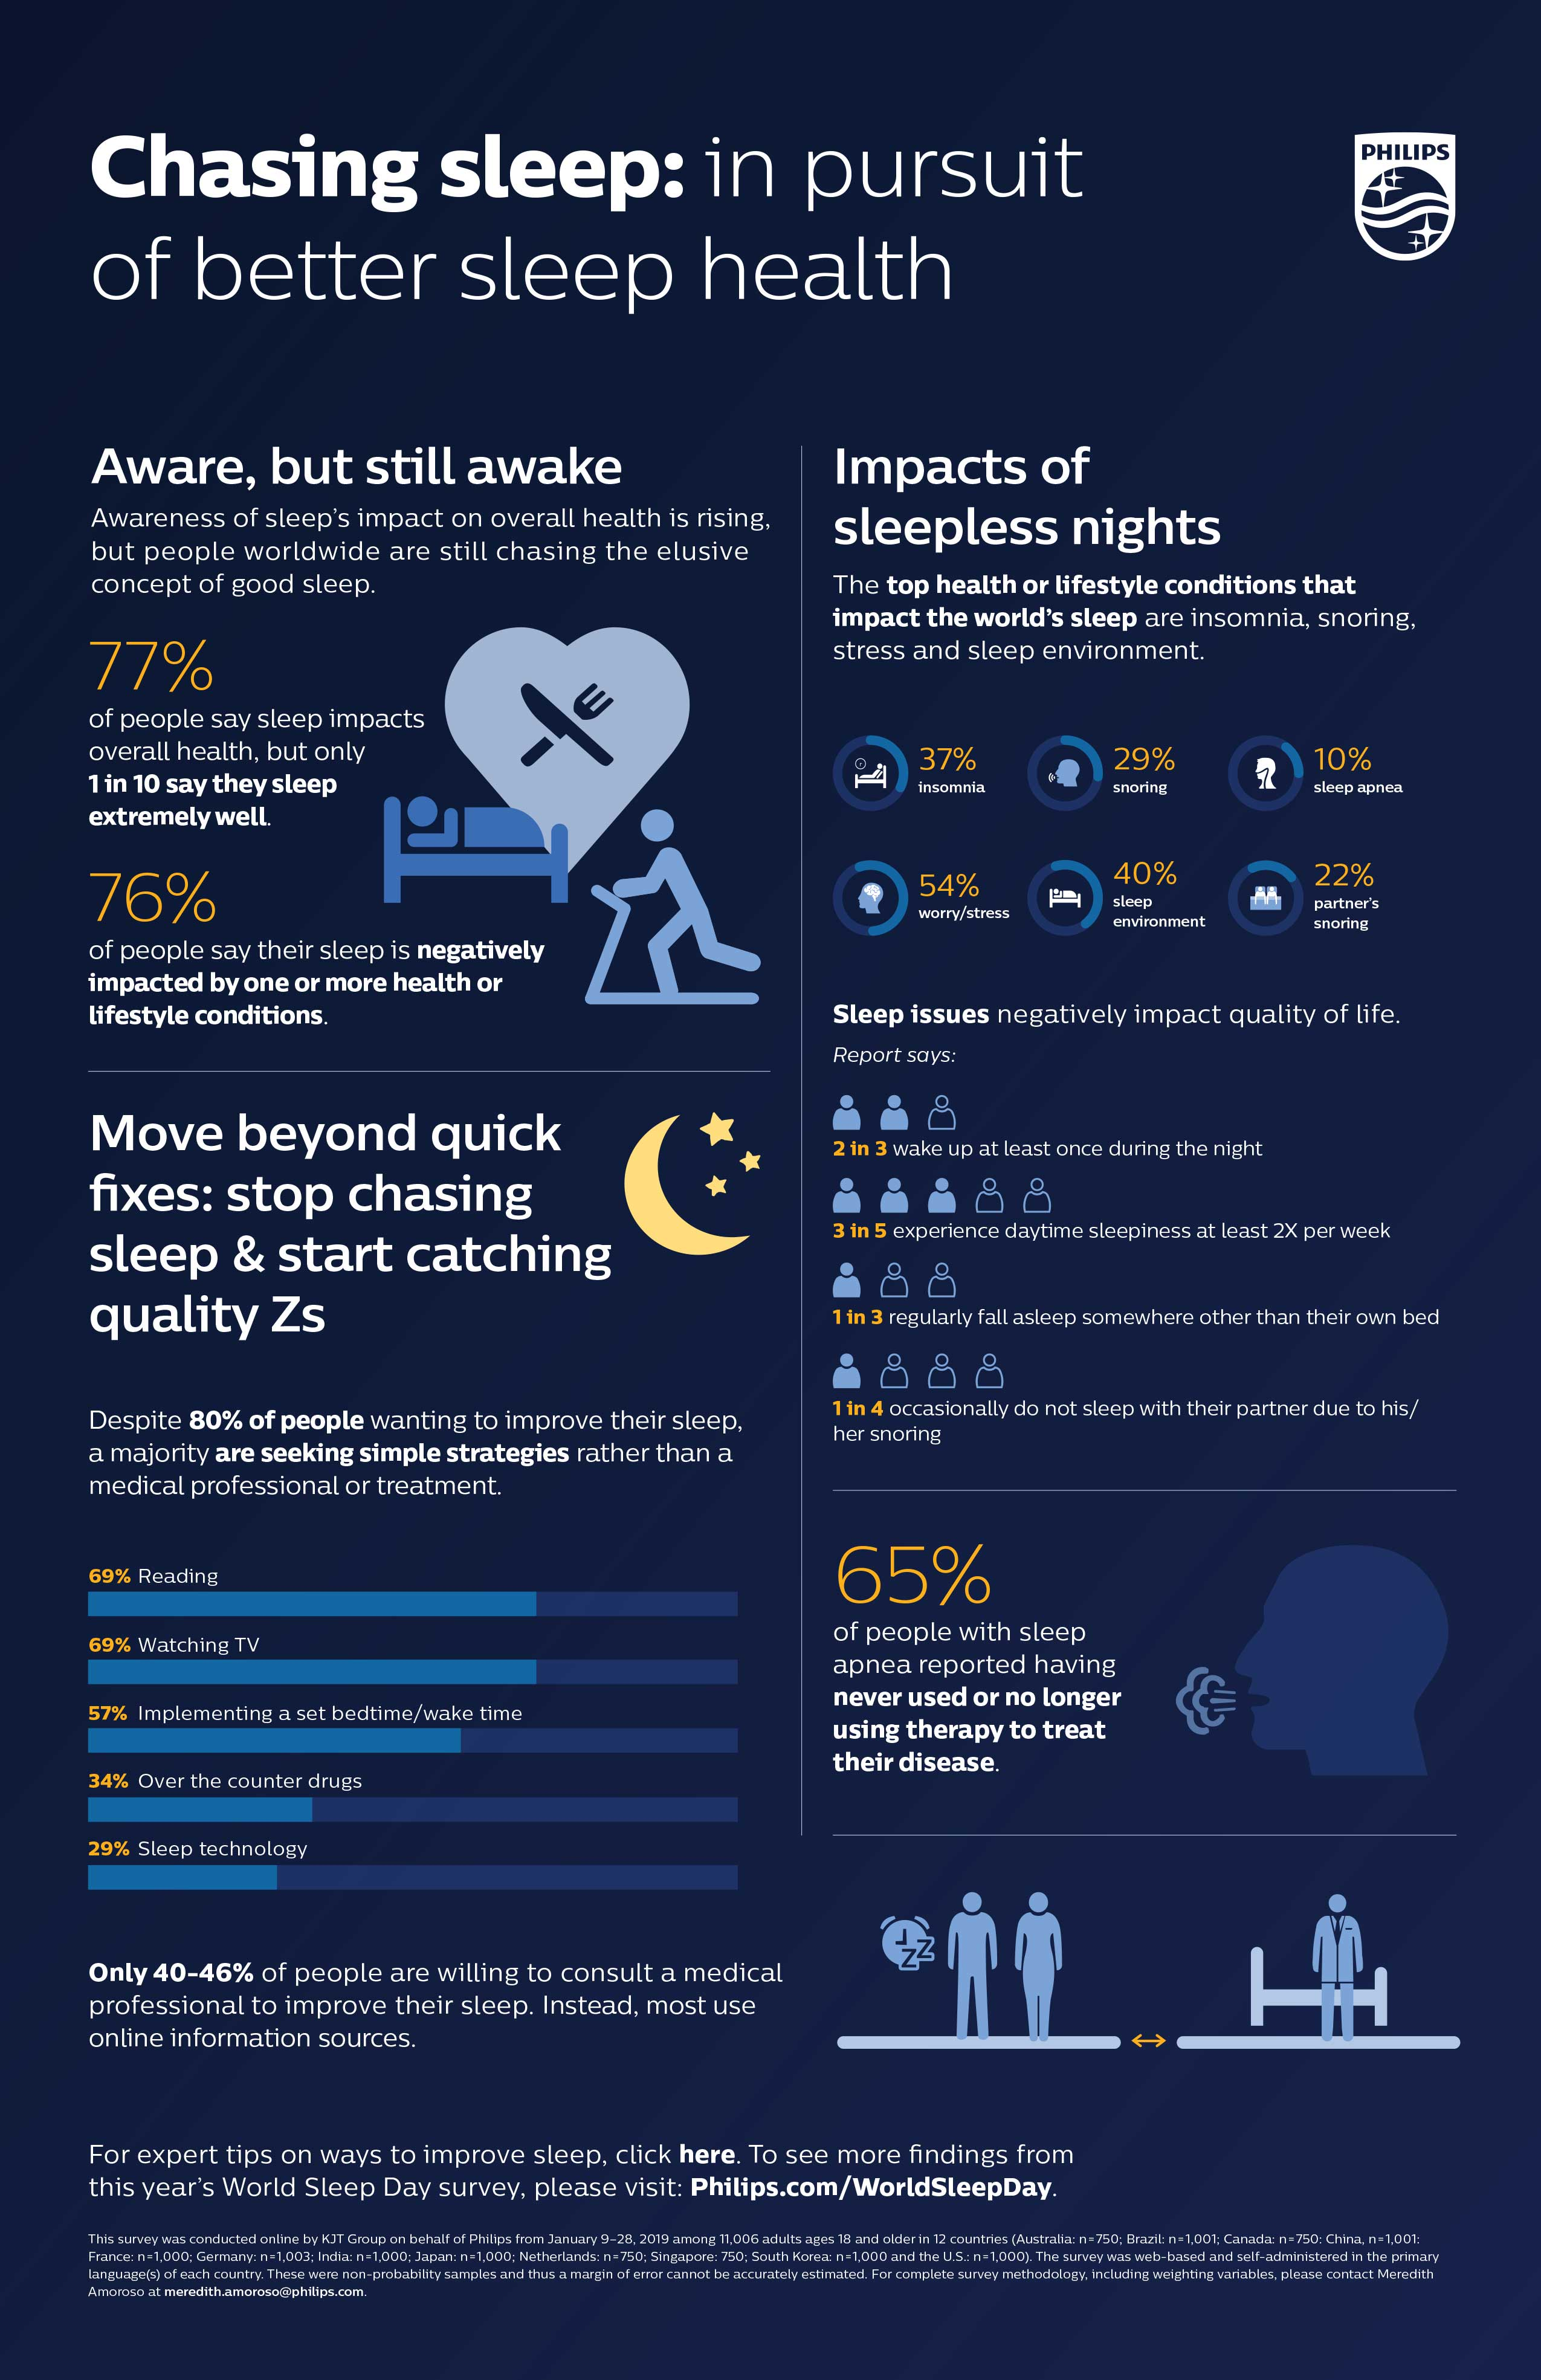 Philips releases global sleep survey data - News | Philips